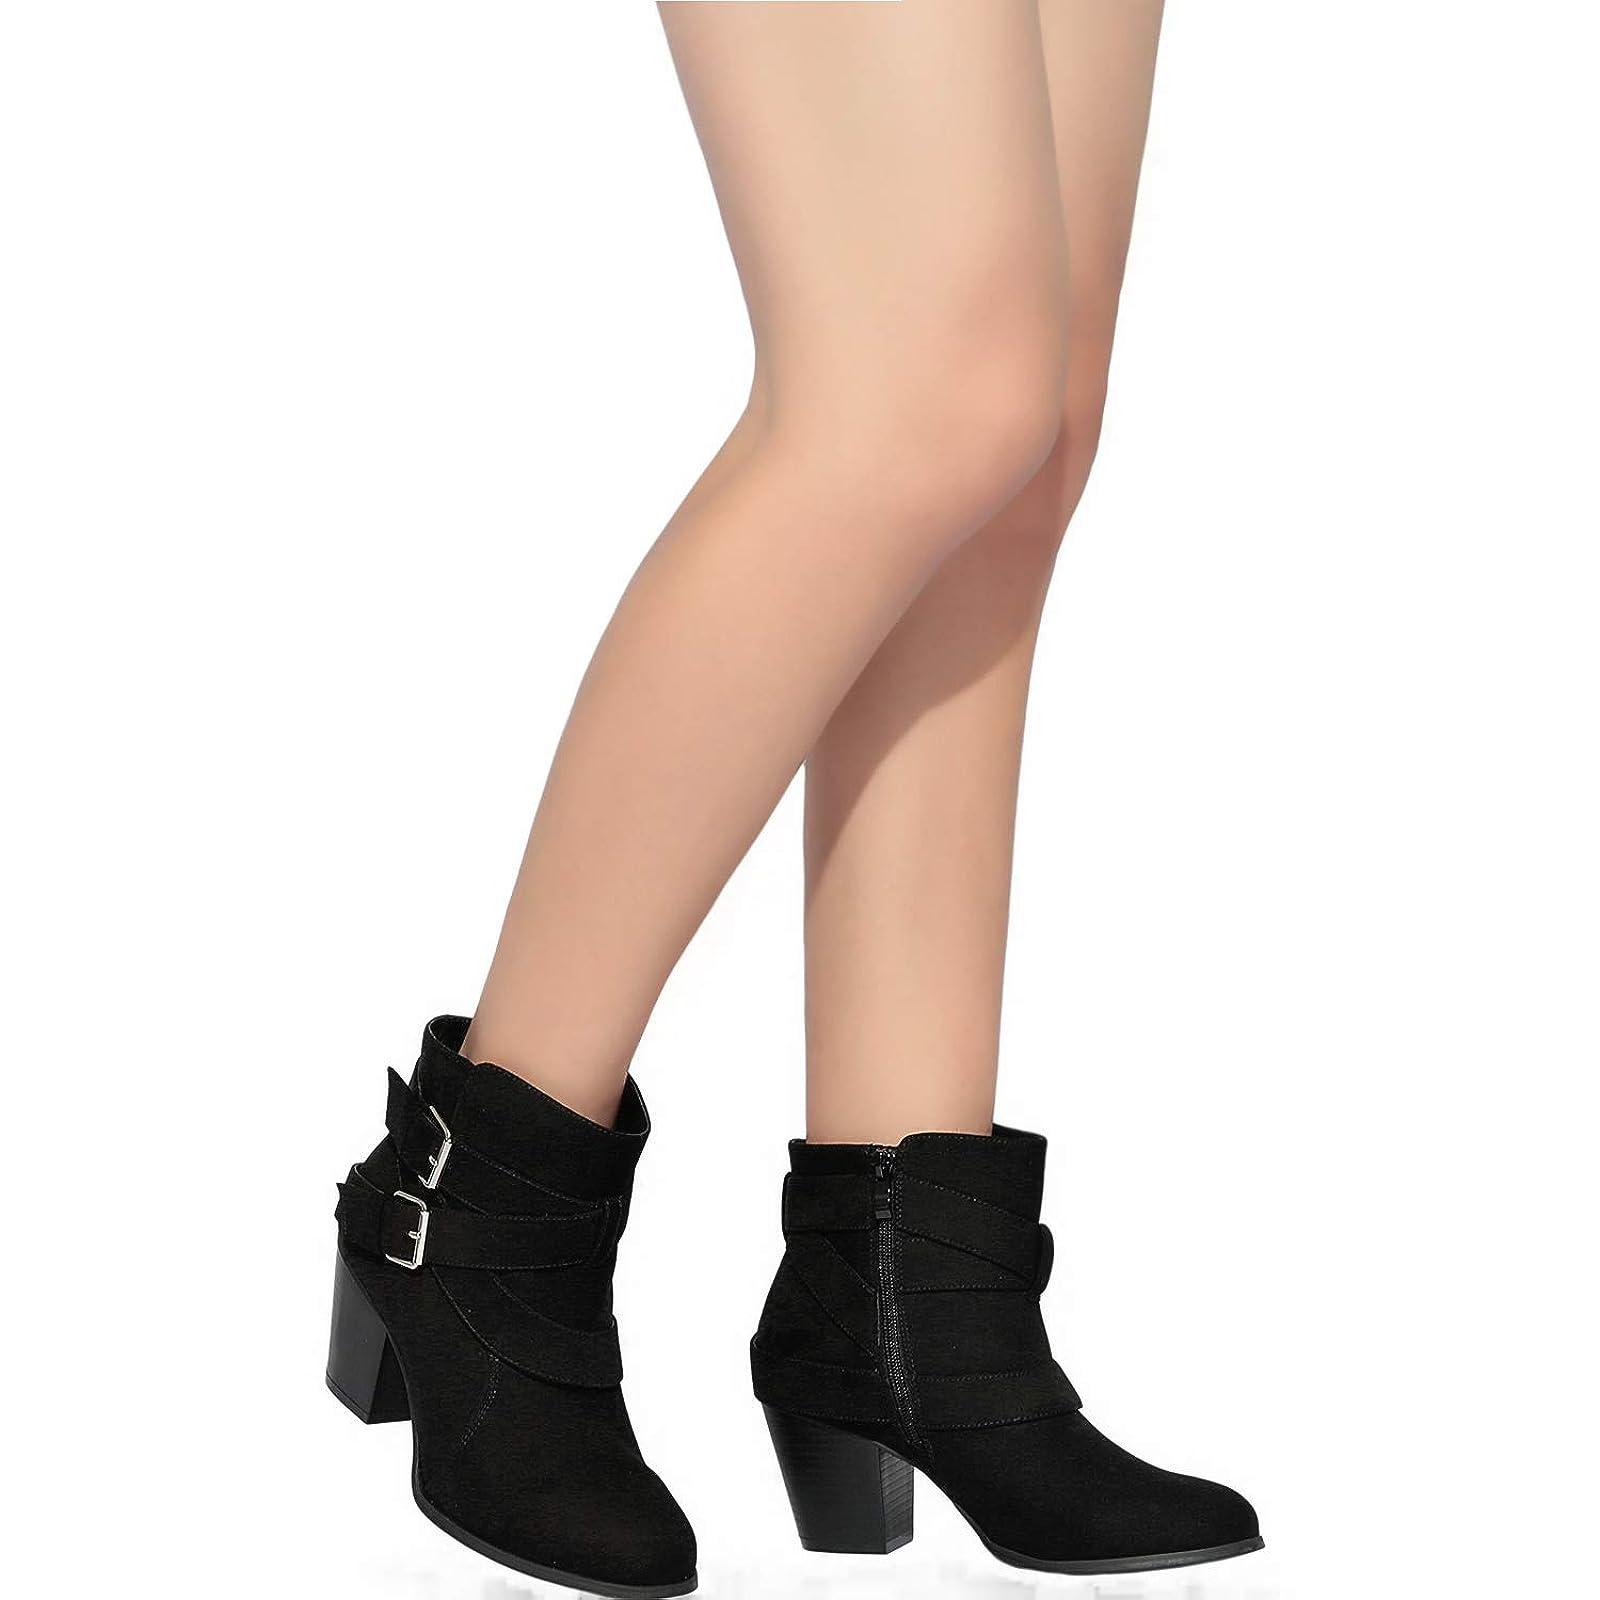 Luoika Women's Wide Width Ankle Boots - Black 10 XW US - 5